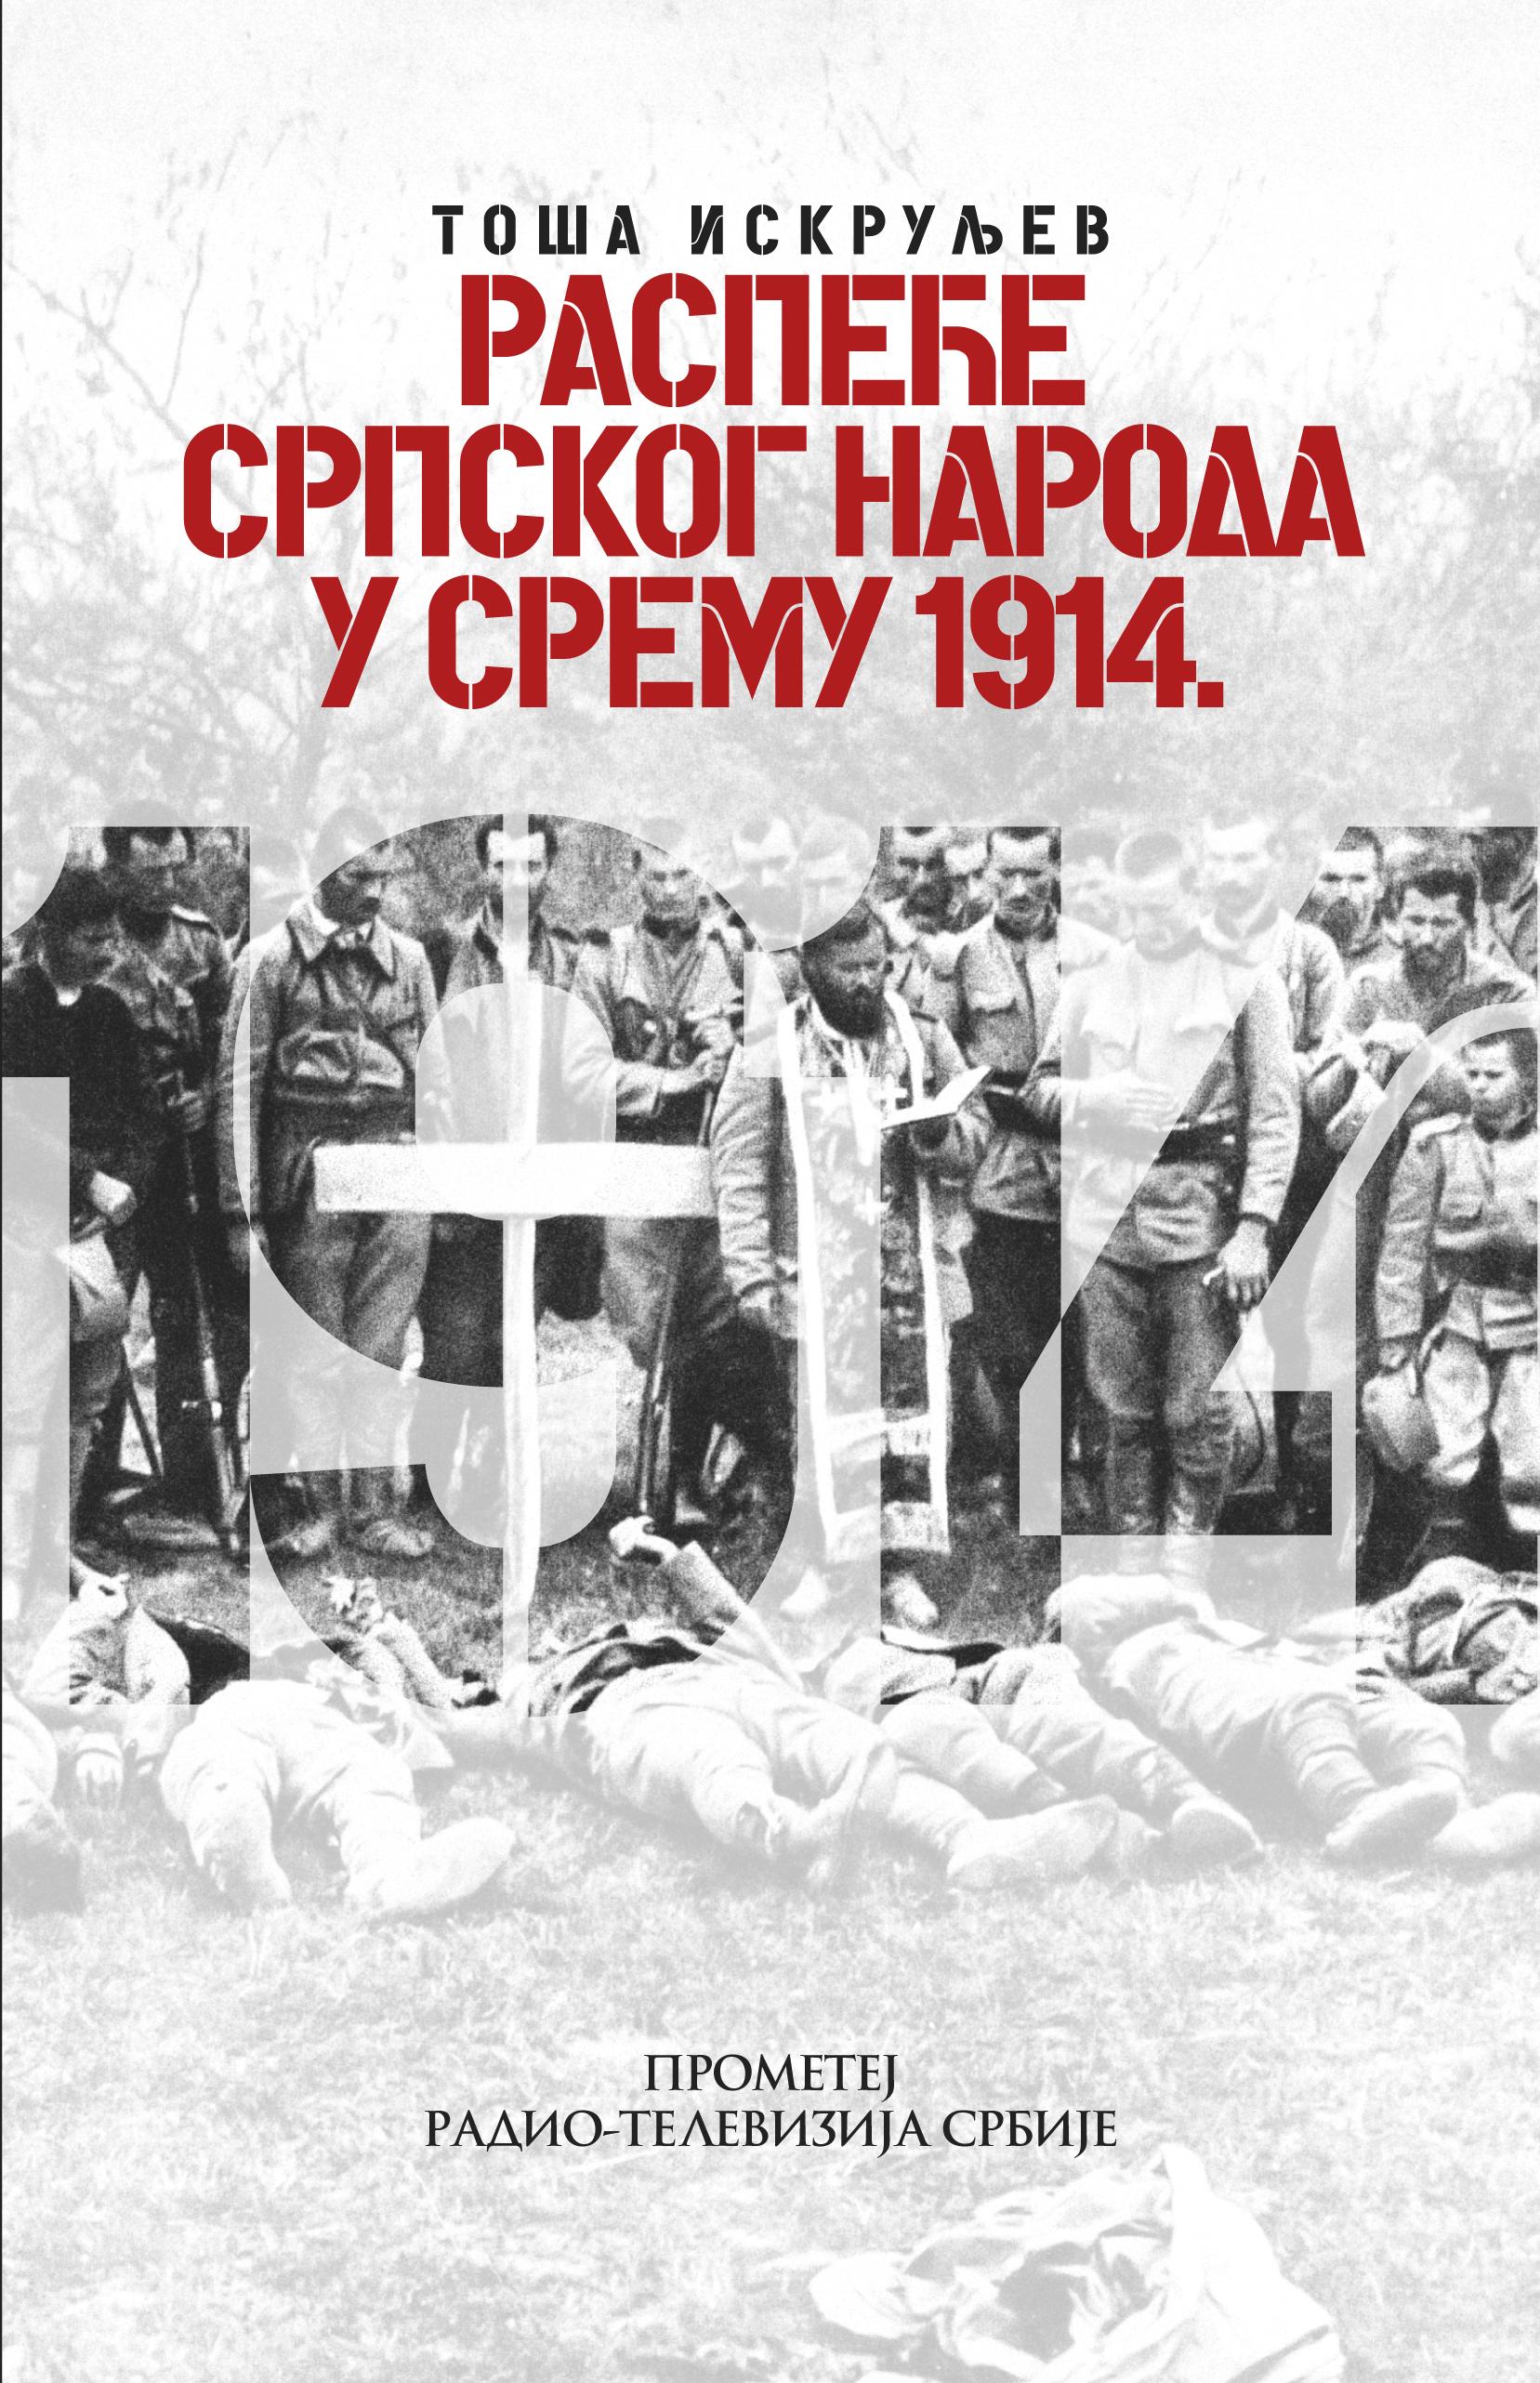 Распеће српског народа у Срему 1914.